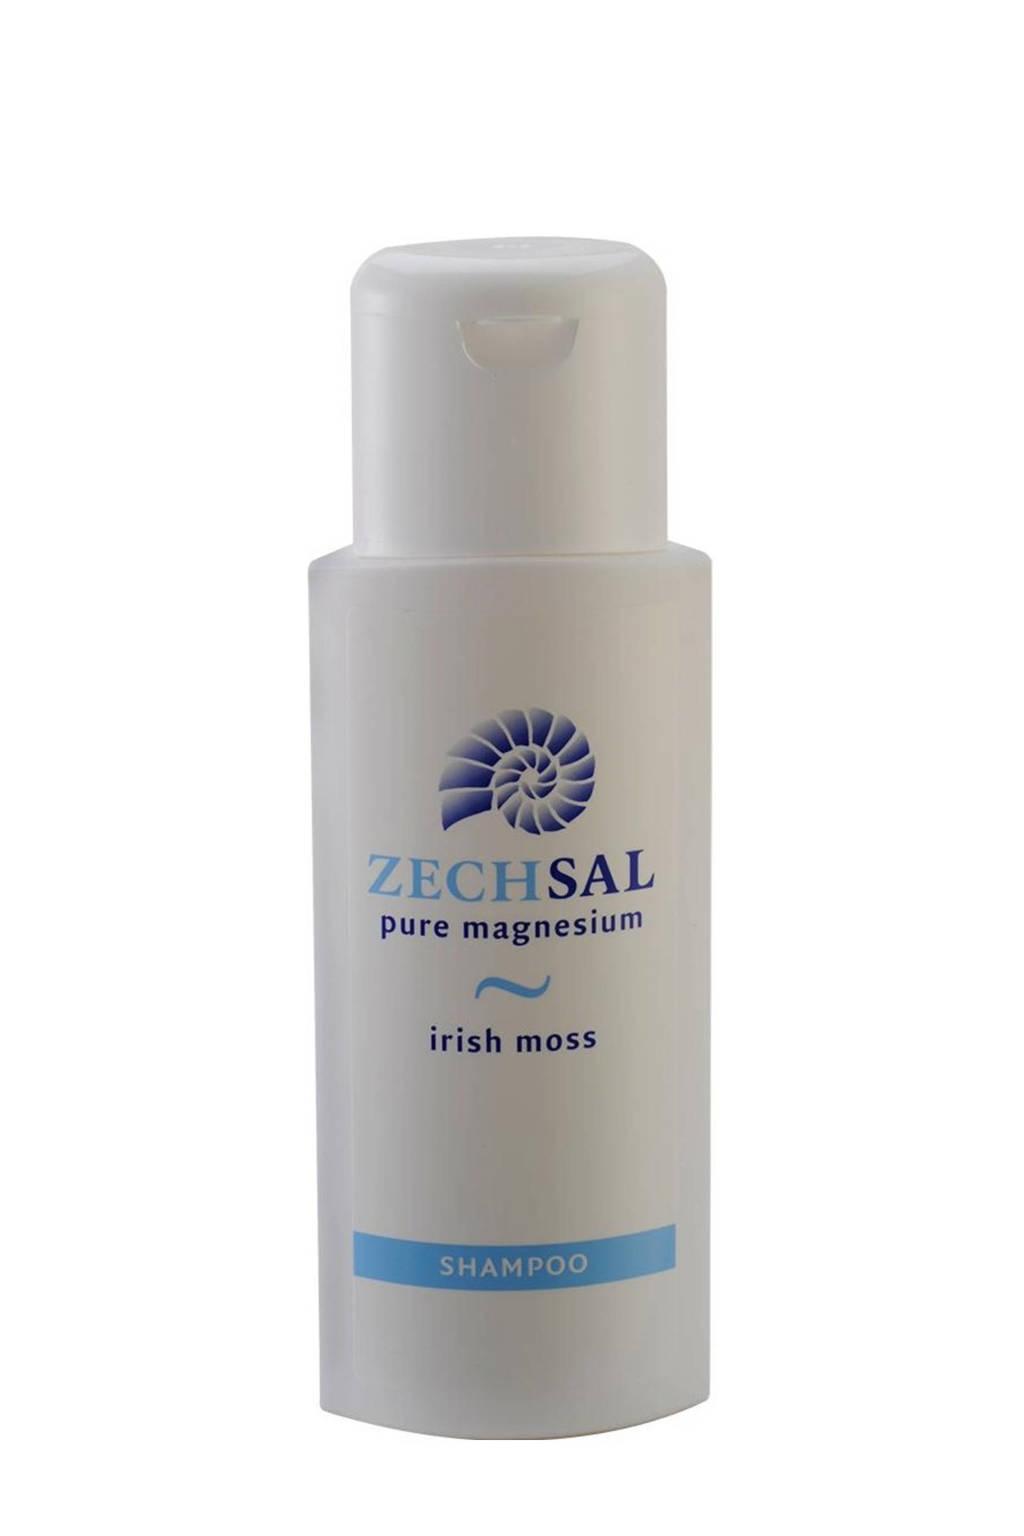 Zechsal Hair & Body Wash - 200 ml